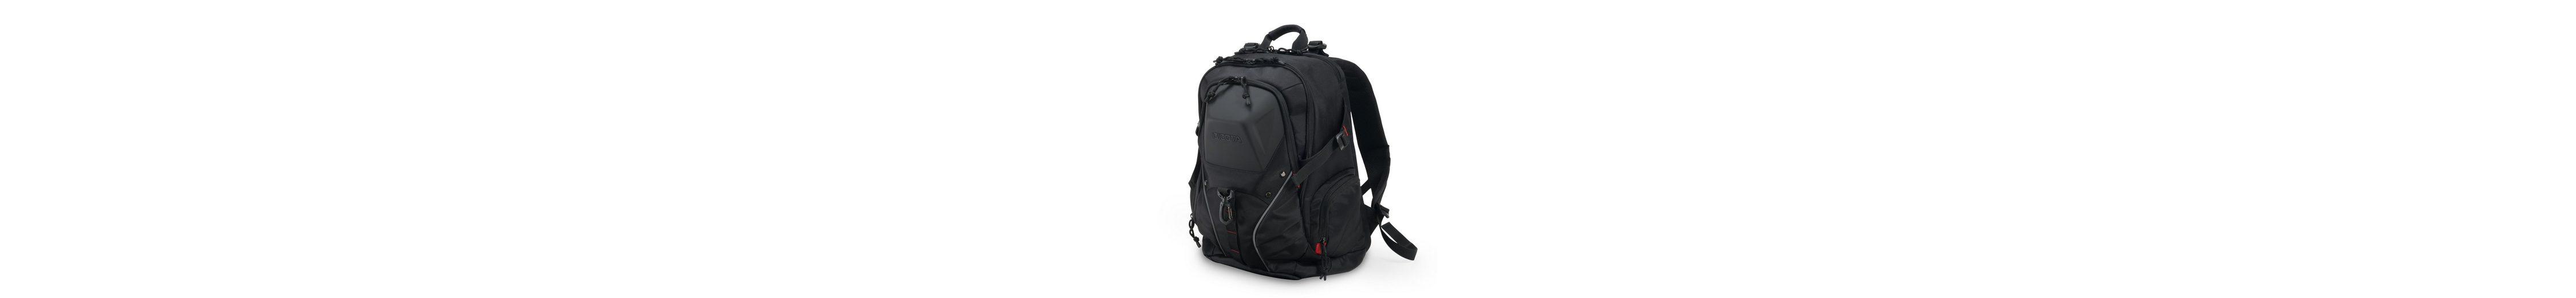 DICOTA Gaming-Notebook-Rucksack Backpack E-Sports (15-17.3